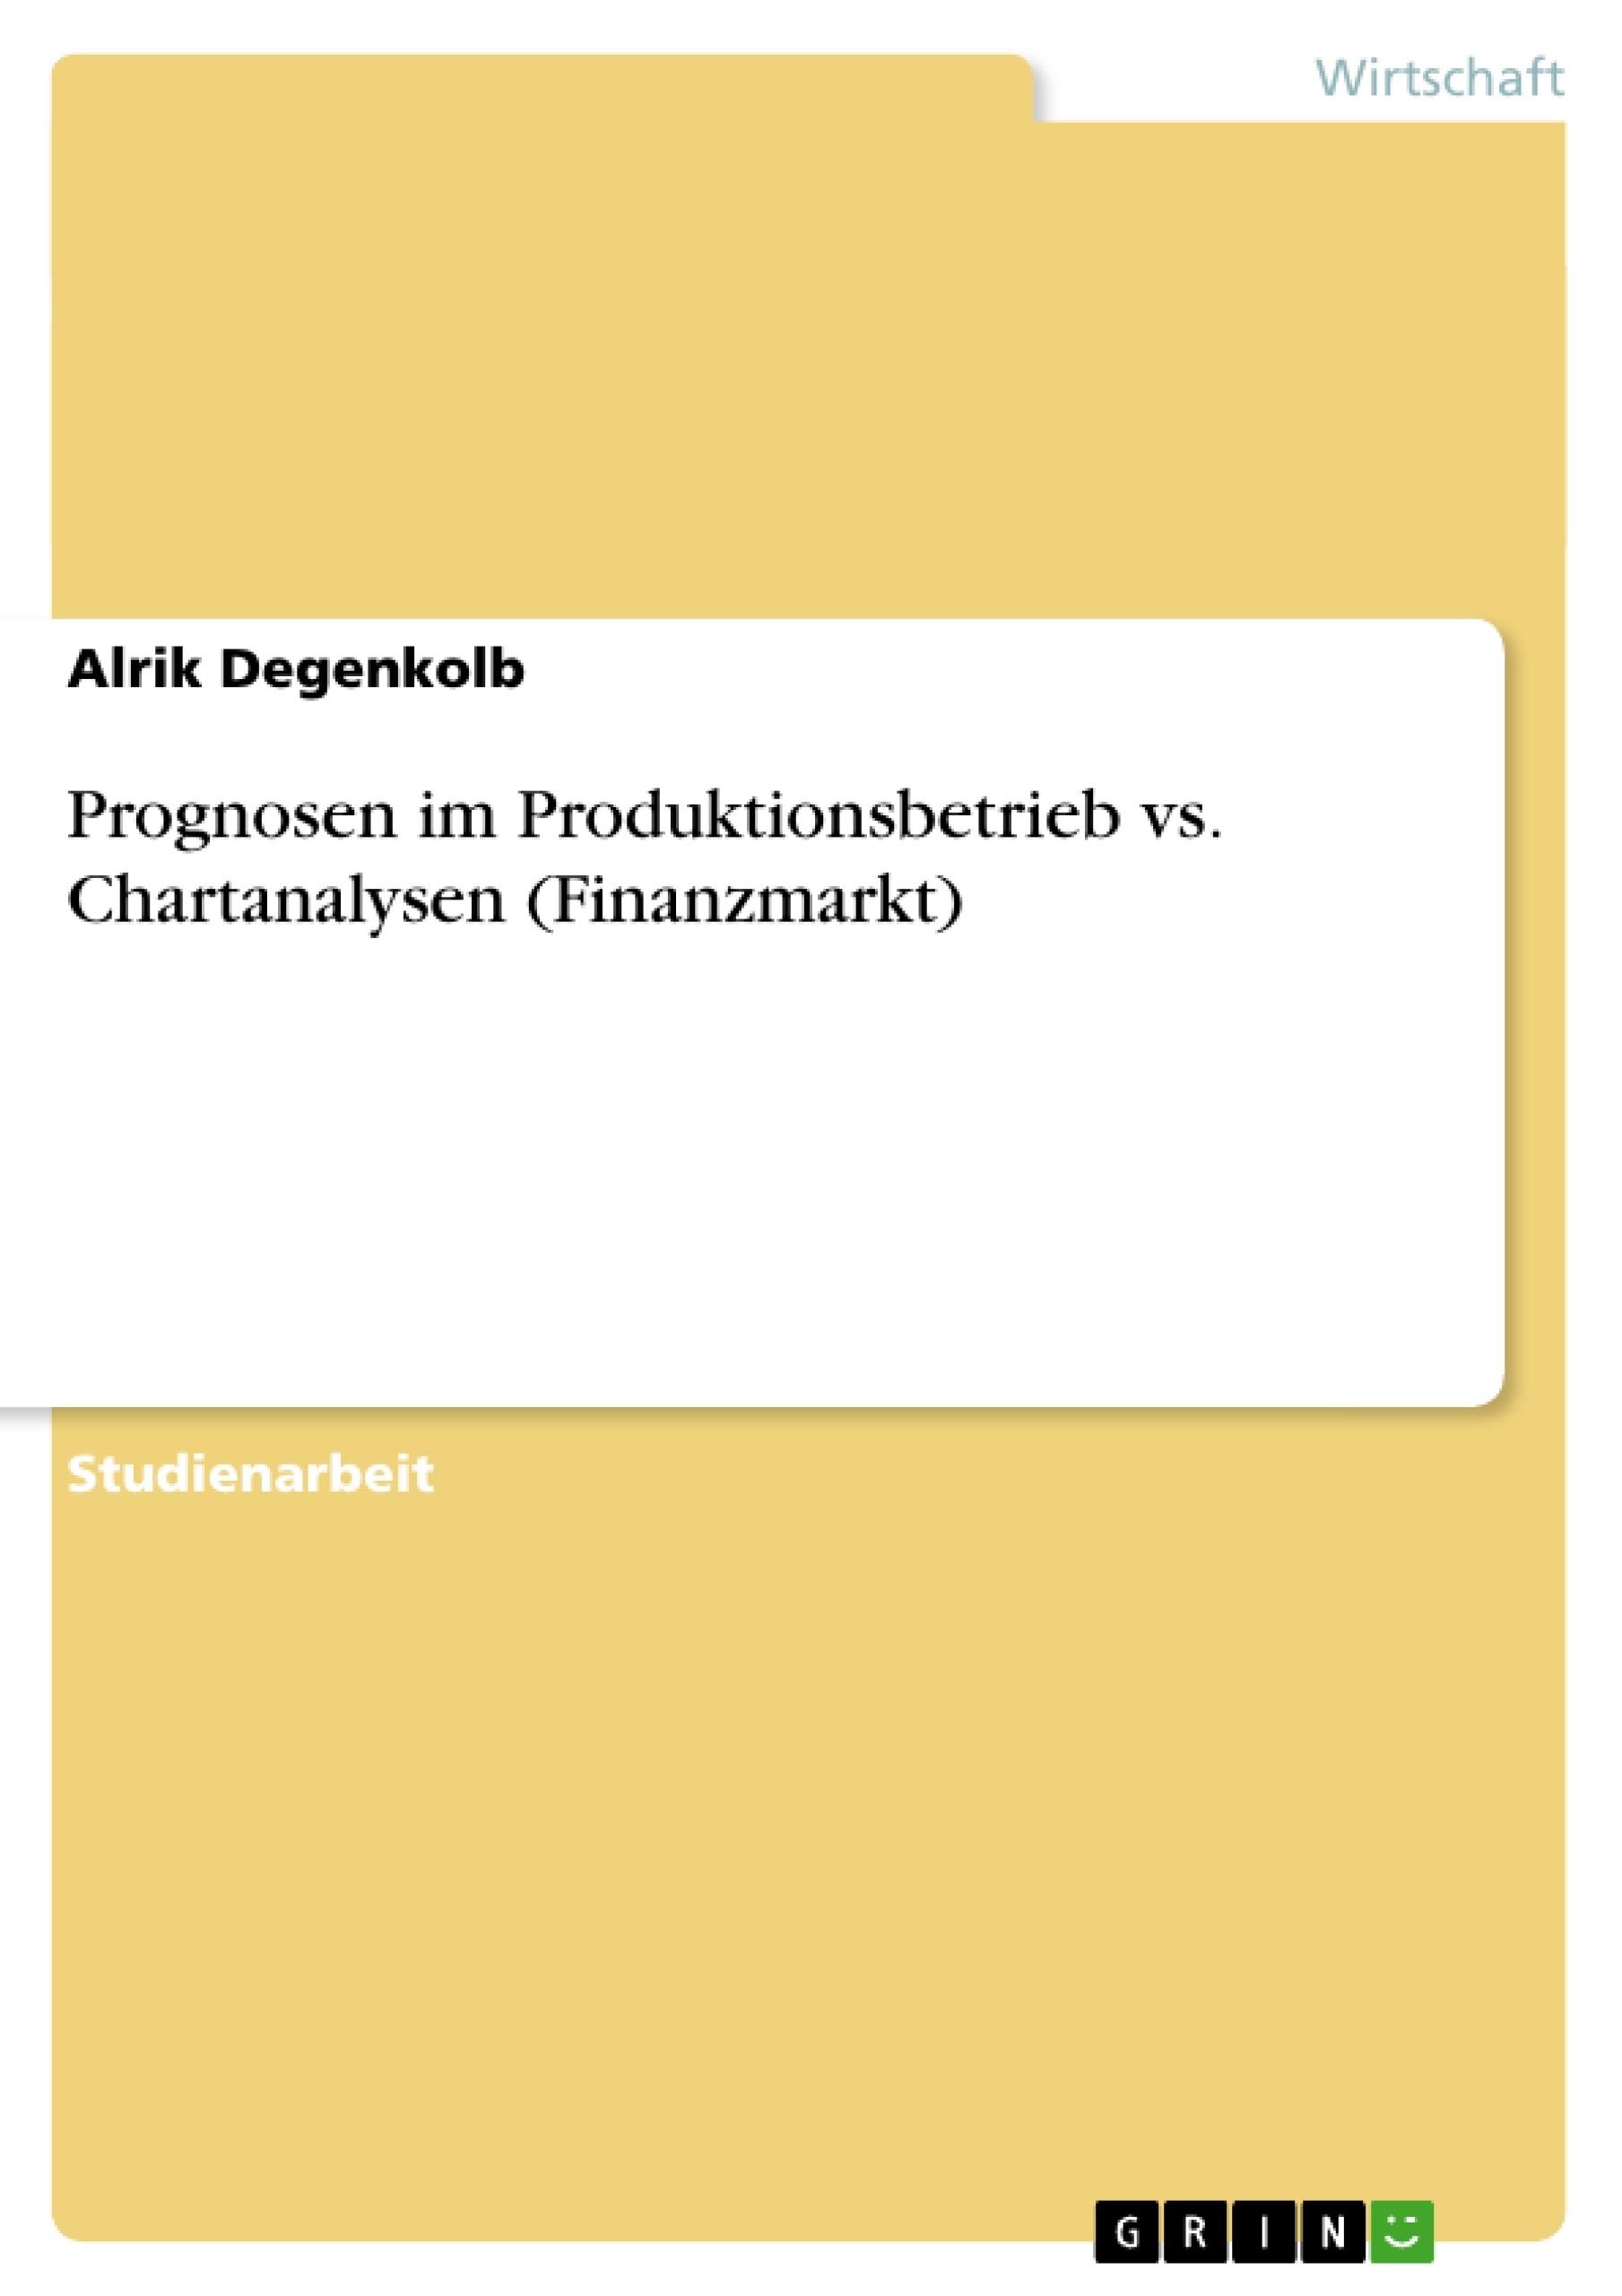 Titel: Prognosen im Produktionsbetrieb vs. Chartanalysen (Finanzmarkt)